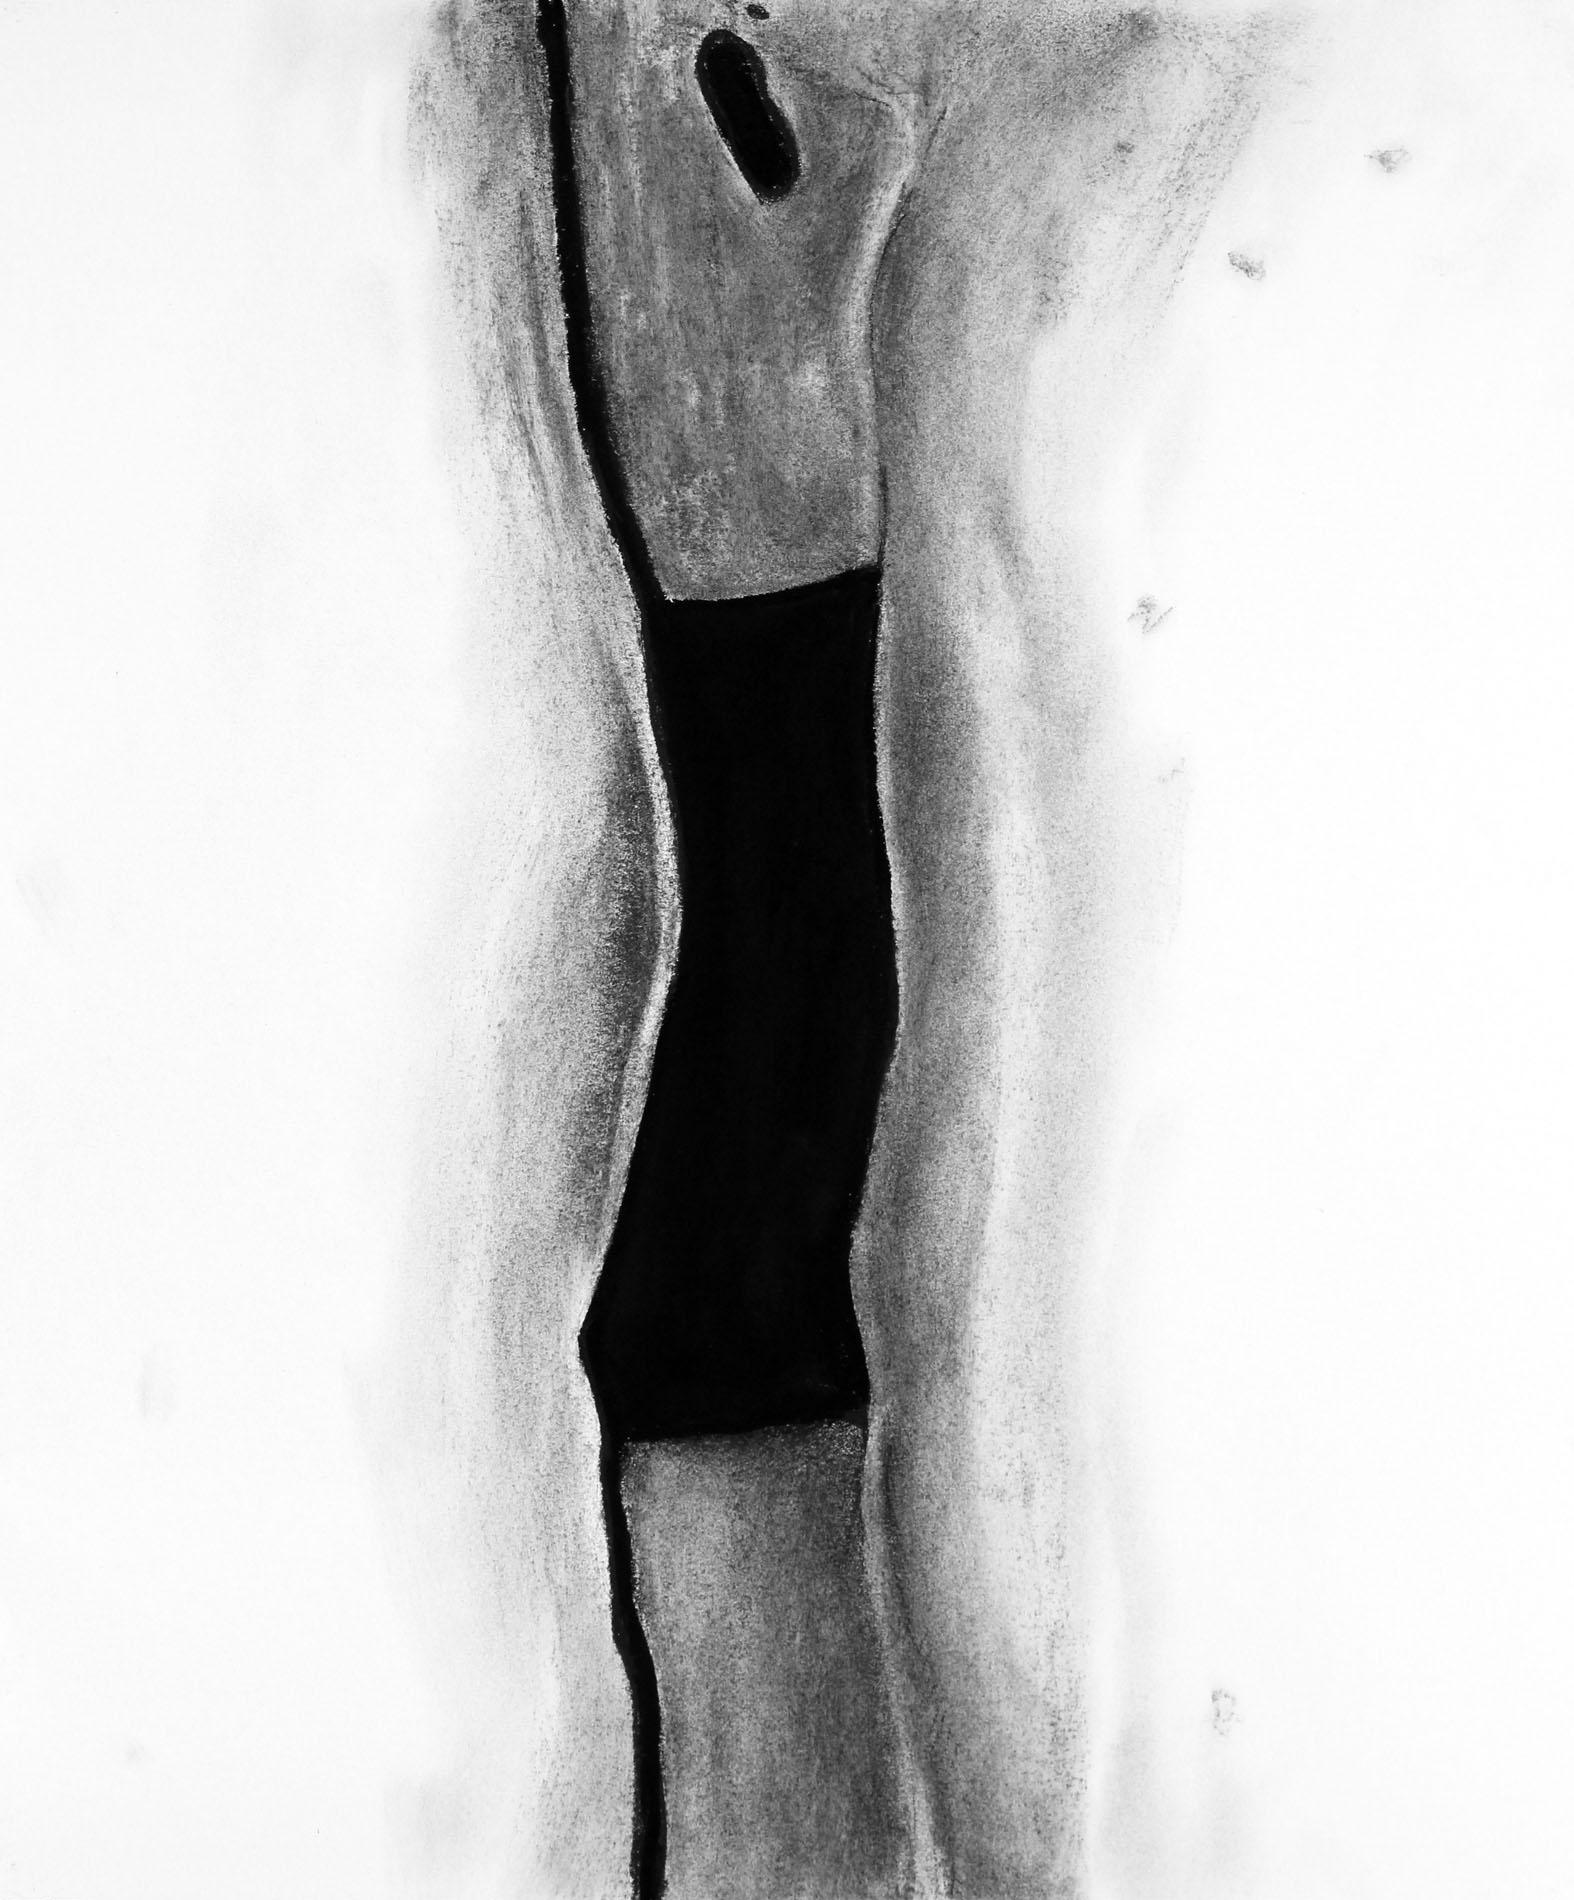 JForan_drawing5.jpg